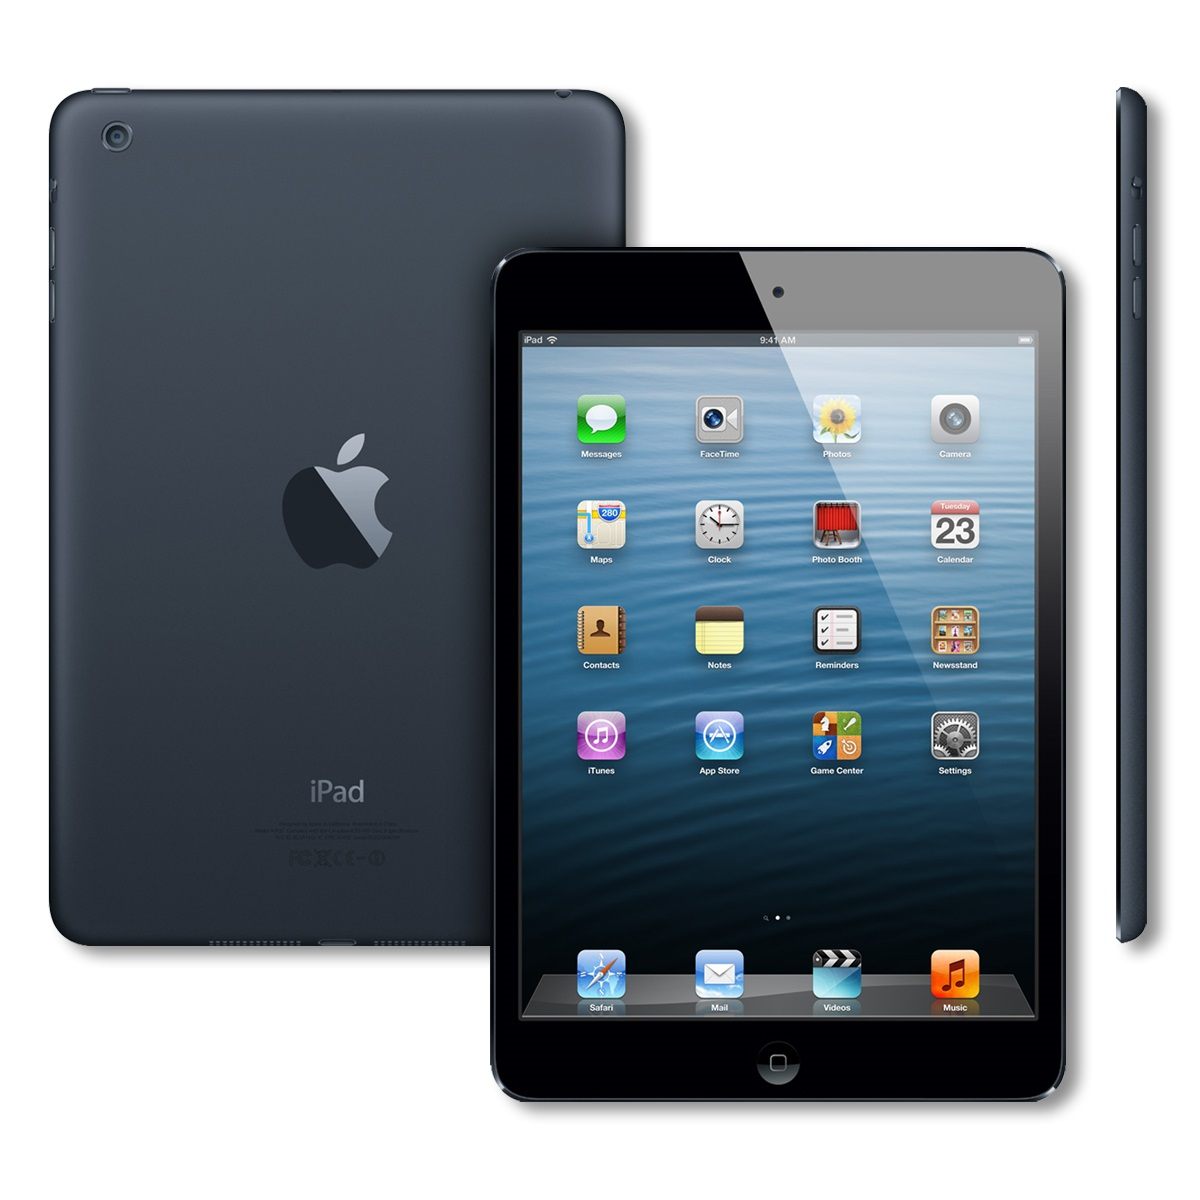 apple ipad mini 1st generation 64gb 7 9 screen wi fi only. Black Bedroom Furniture Sets. Home Design Ideas